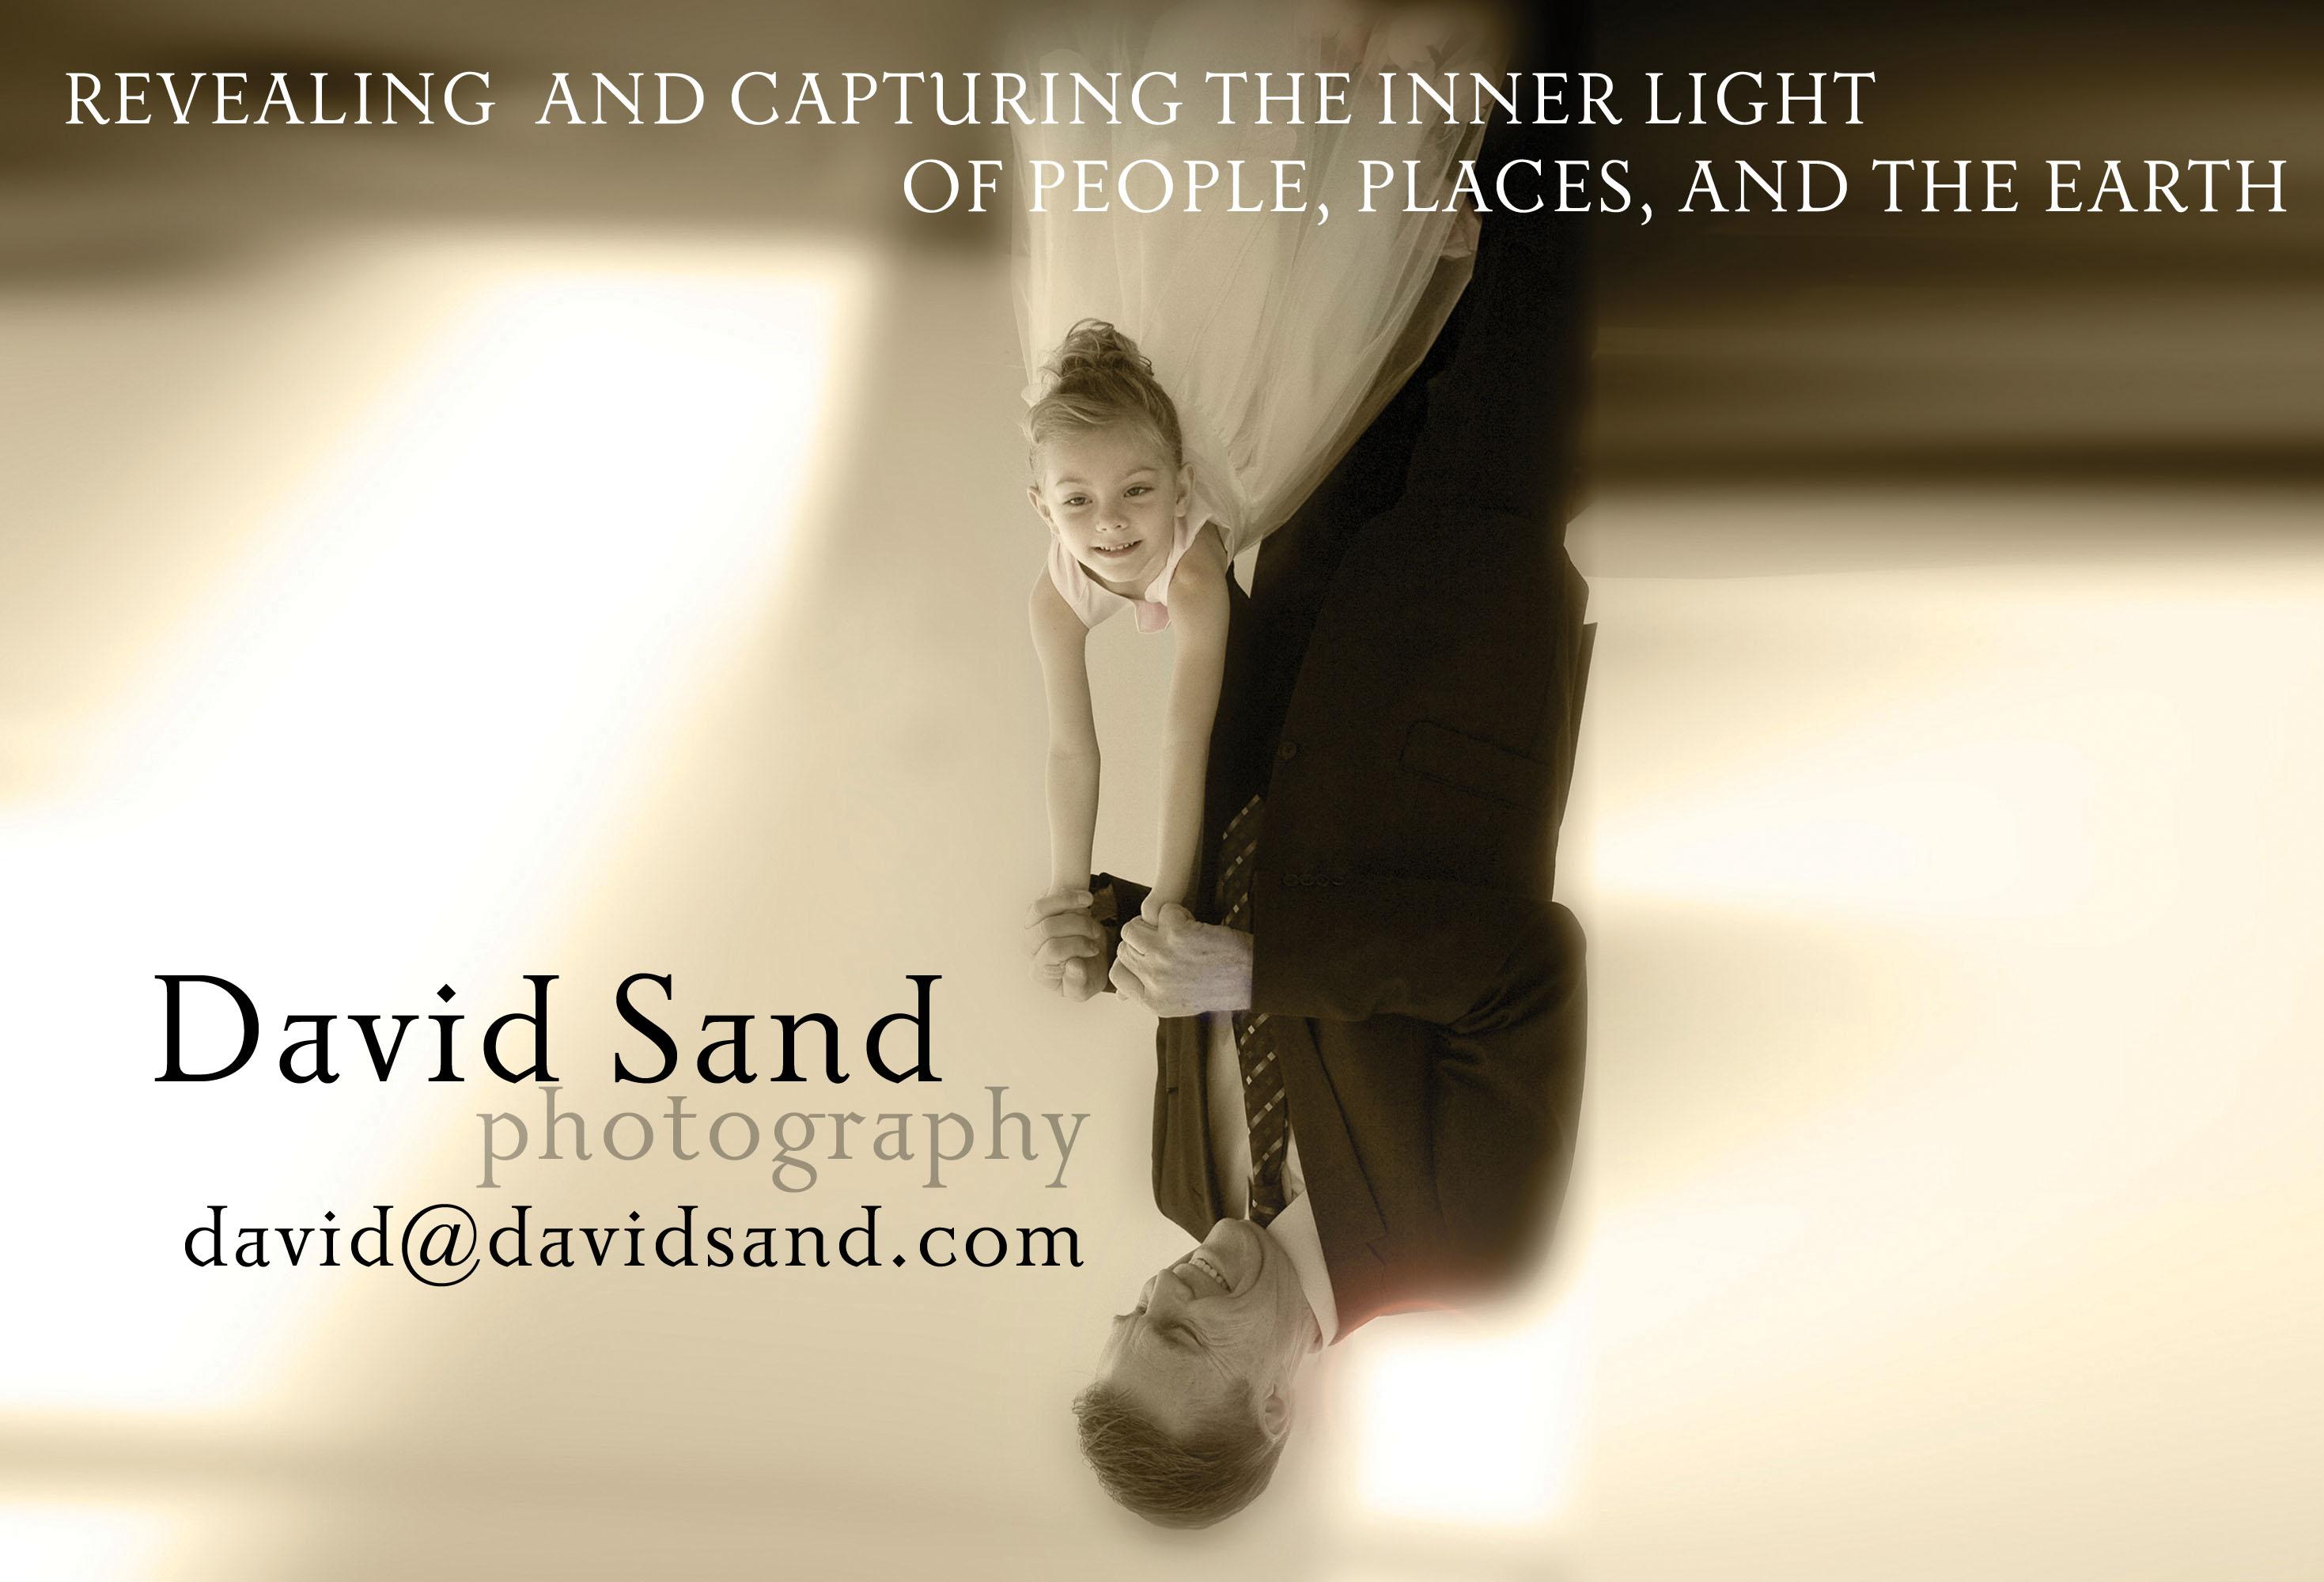 David Sand photography